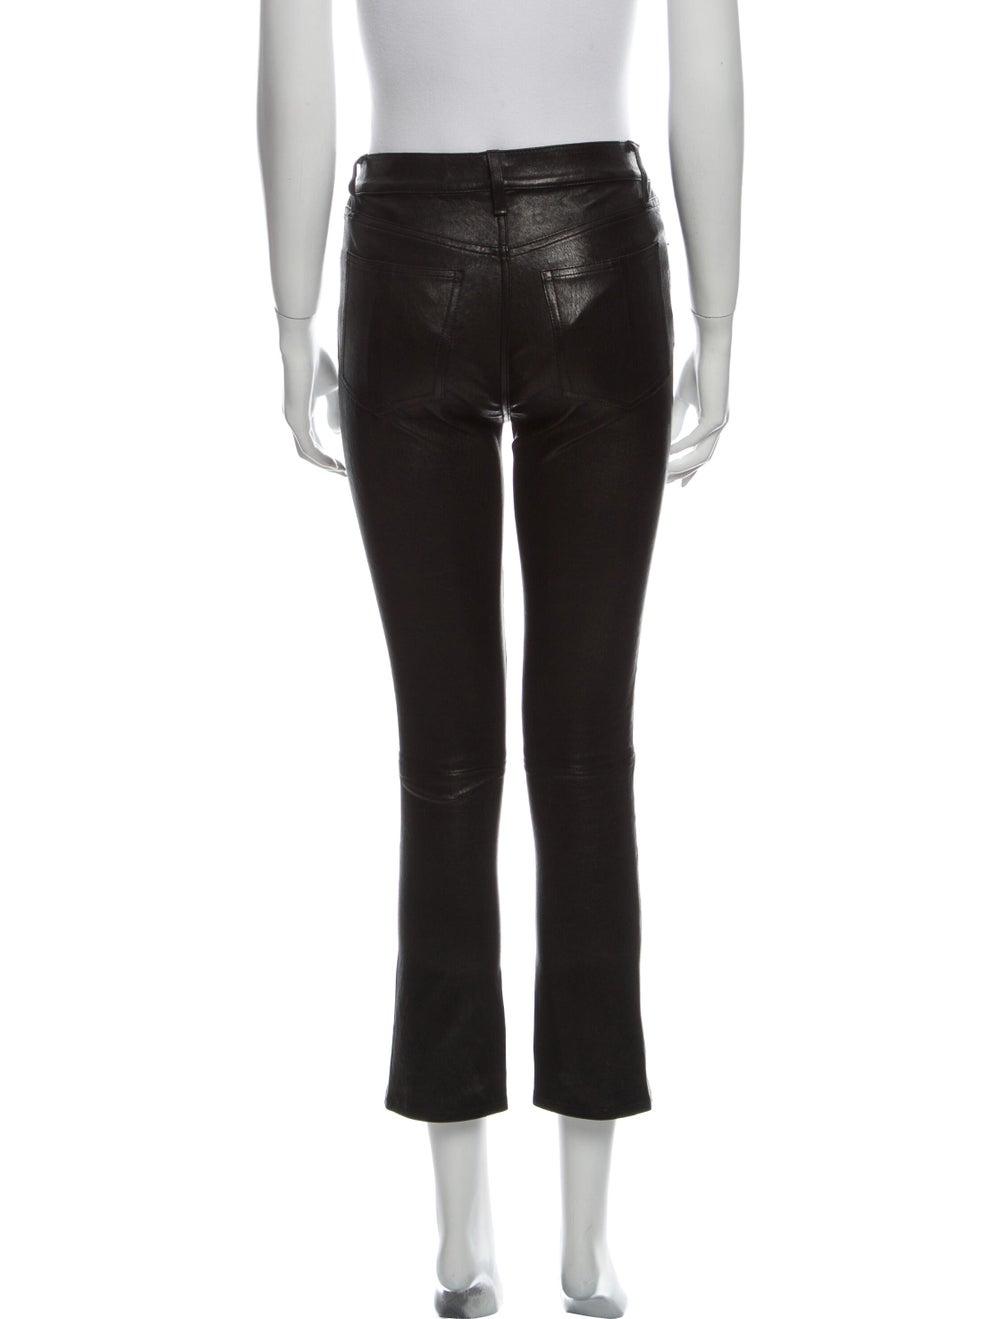 Rag & Bone Lamb Leather Straight Leg Pants Black - image 3